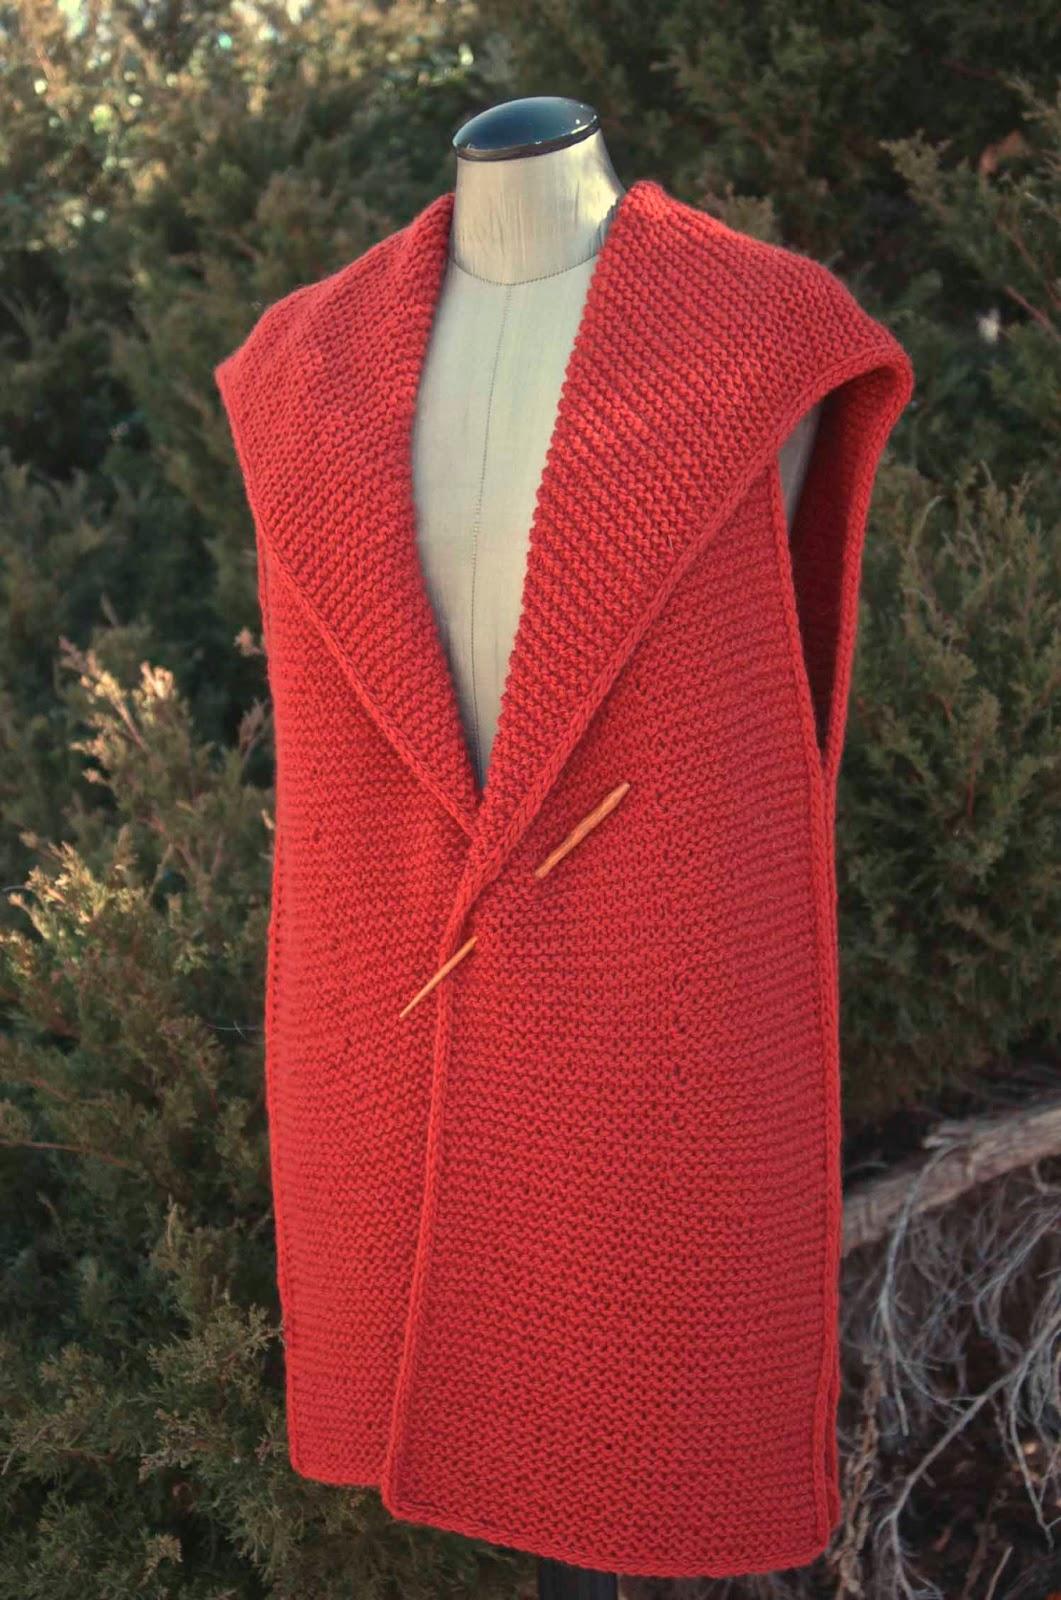 Knitaway: Moebius Vest Workshop At Knit Knack